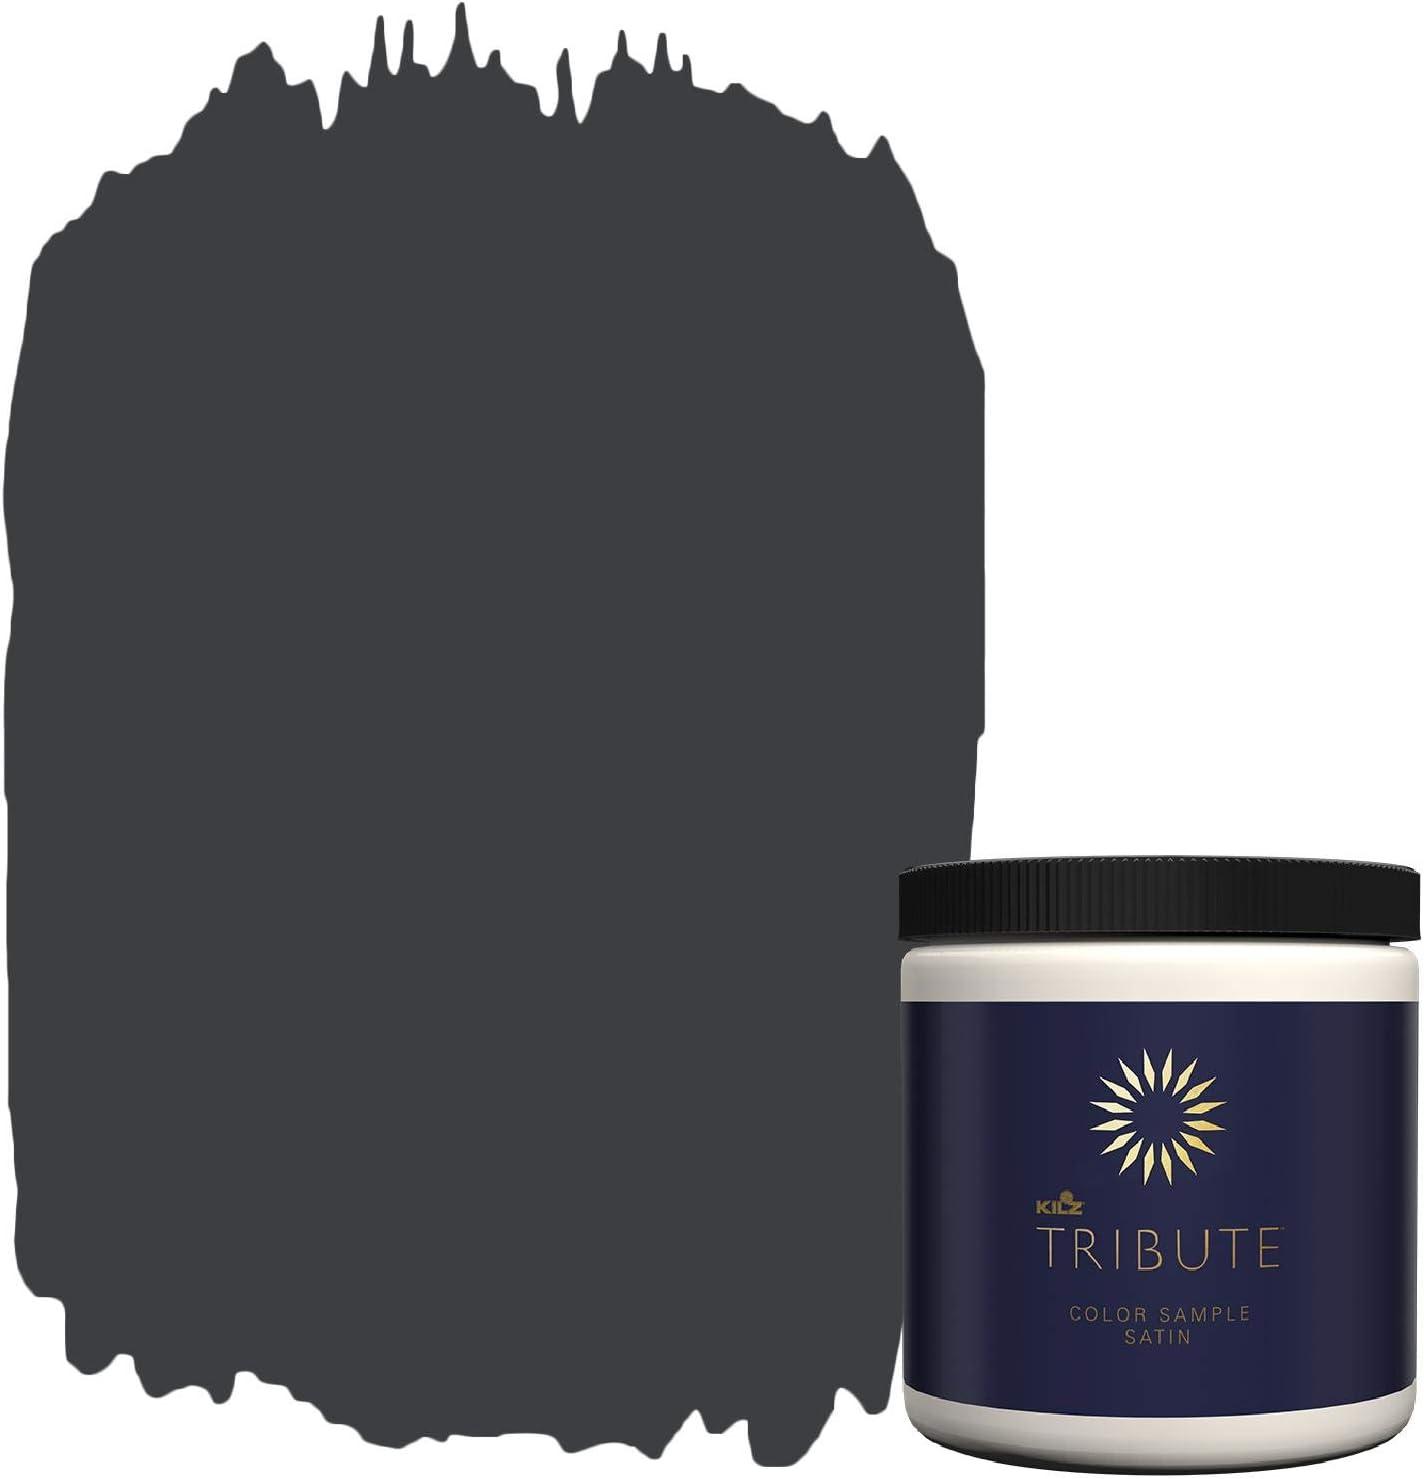 KILZ TRIBUTE Interior Satin Paint & Primer In One, 8-Ounce Sample, Deep Onyx (TB-40)